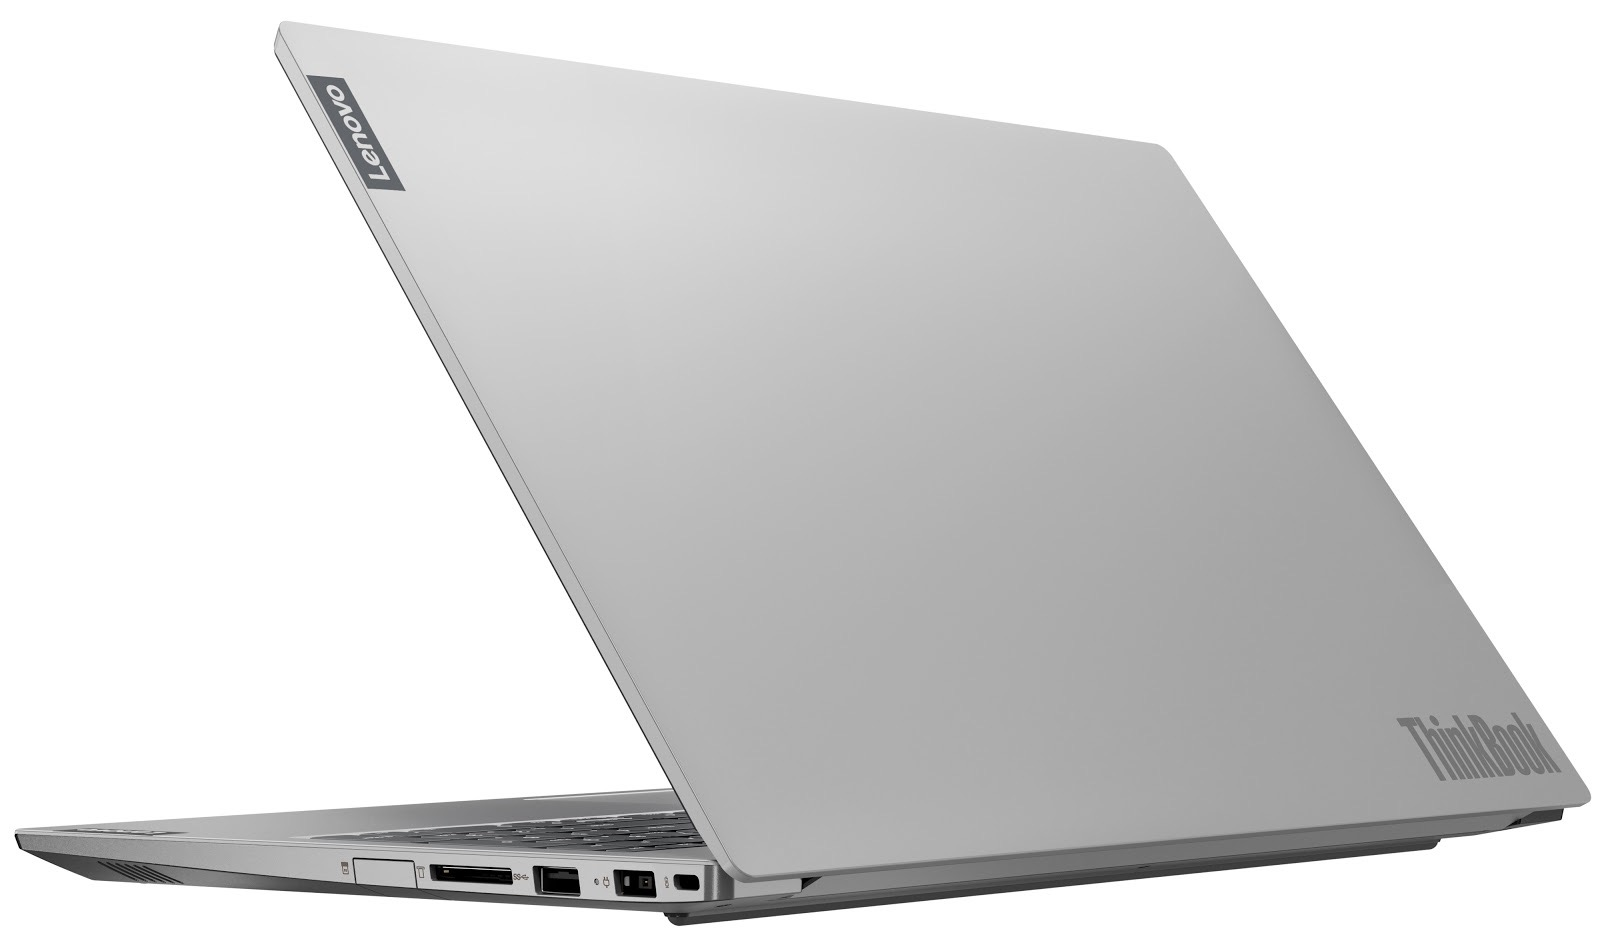 Фото 1. Ноутбук Lenovo ThinkBook 15-IIL (20SM002LRU)